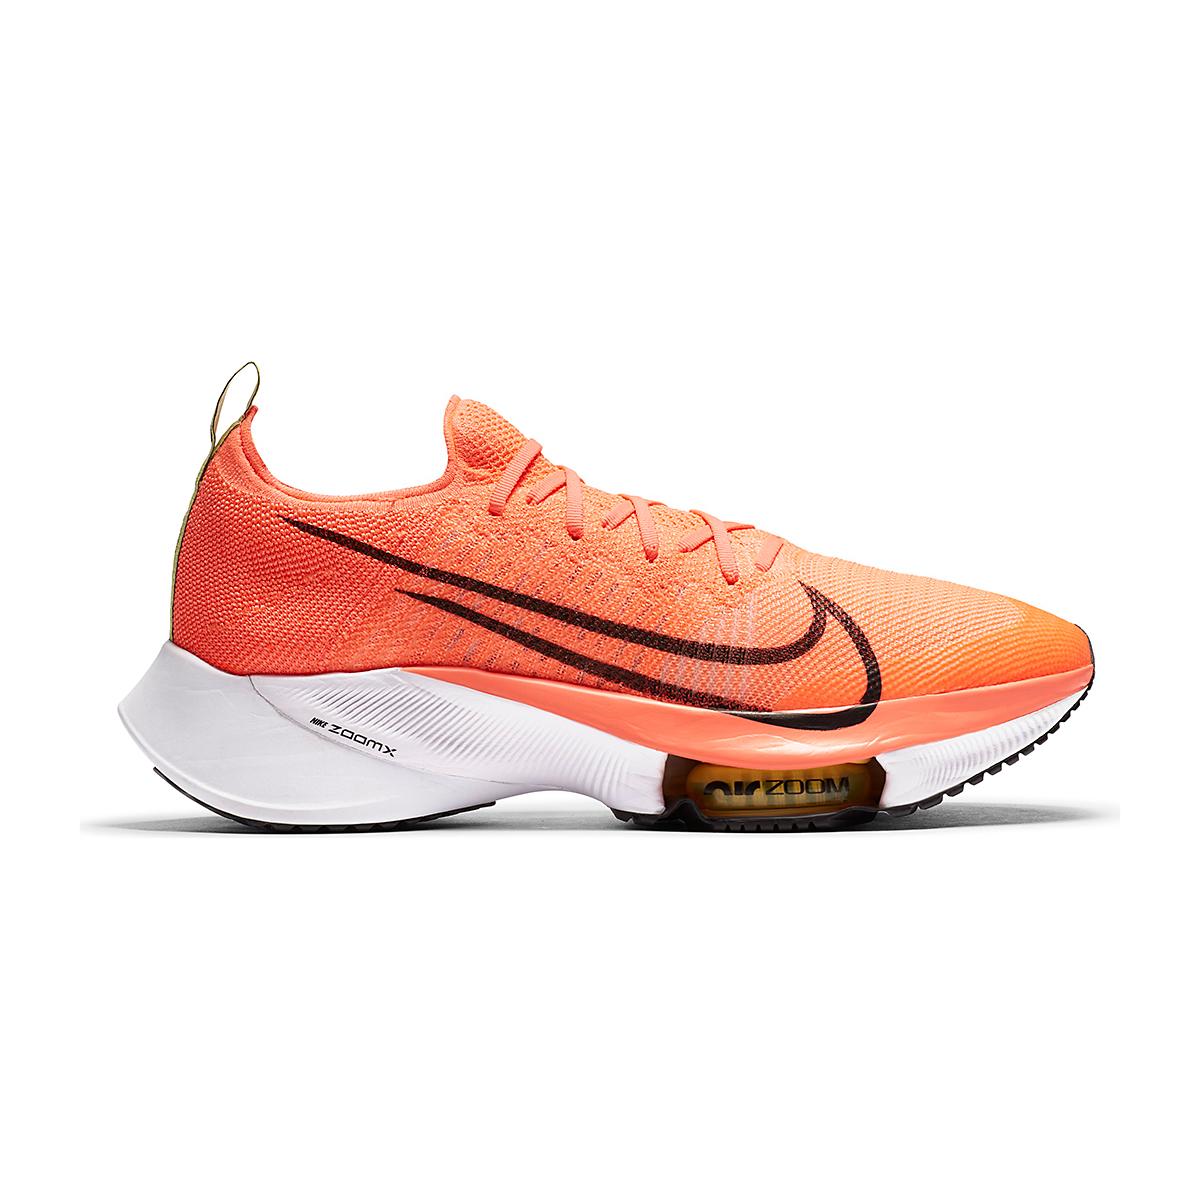 Men's Nike Air Zoom Tempo NEXT% Running Shoe - Color: Bright Mango/Black-Citron Pulse - Size: 6 - Width: Regular, Bright Mango/Black-Citron Pulse, large, image 1